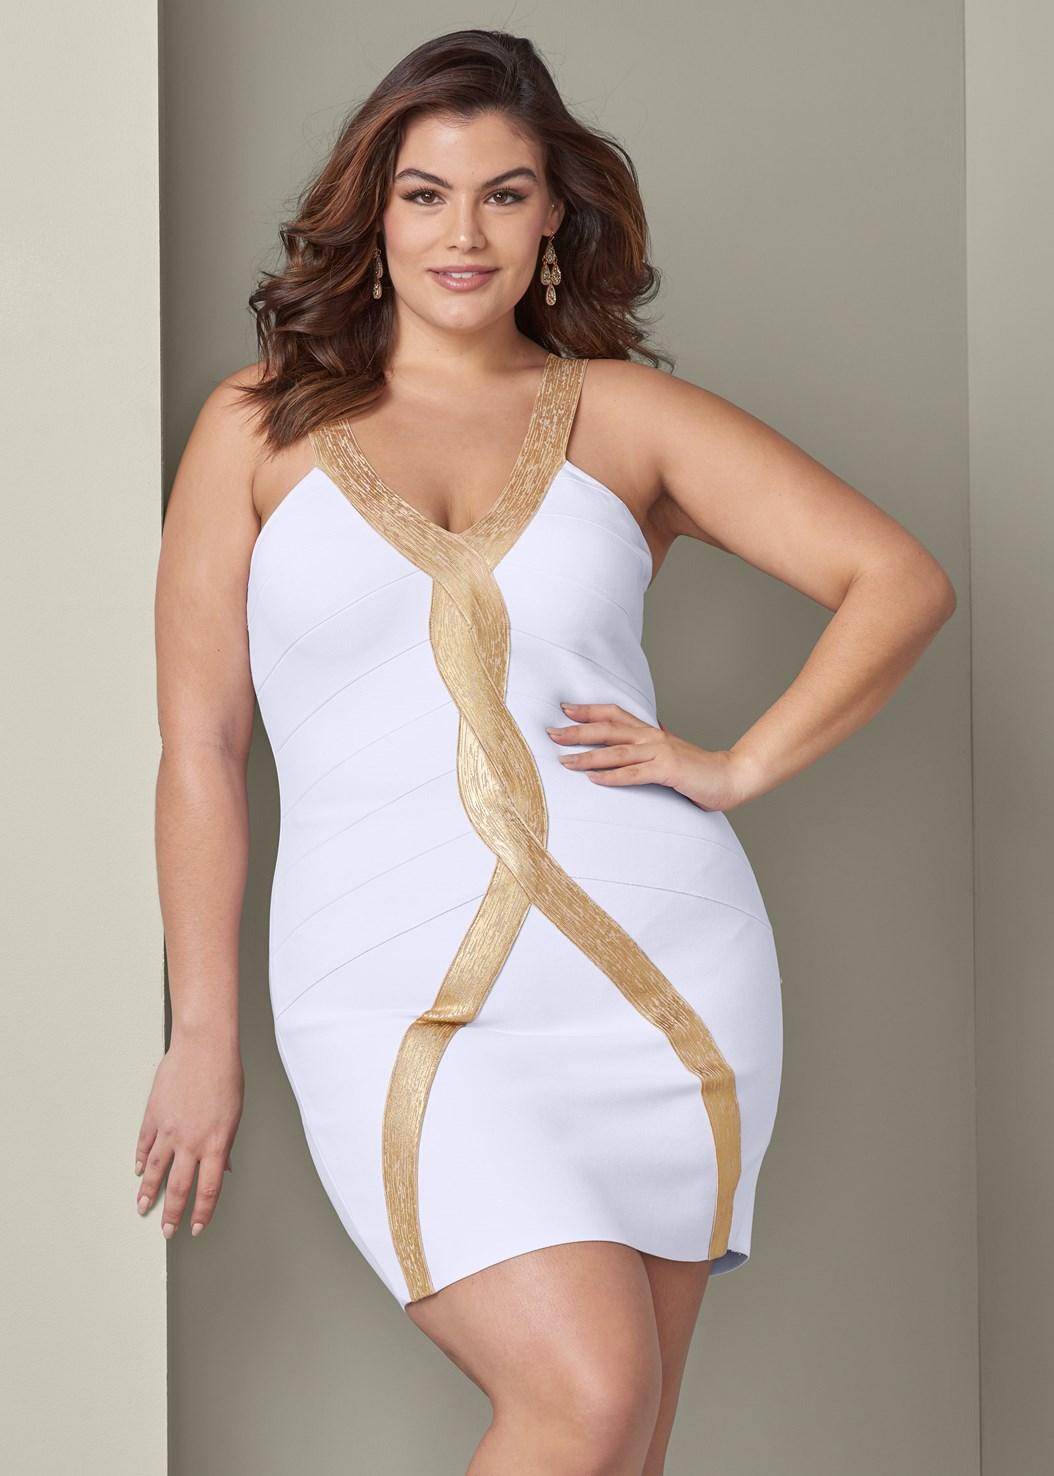 Bandage Bodycon Dress,High Heel Strappy Sandals